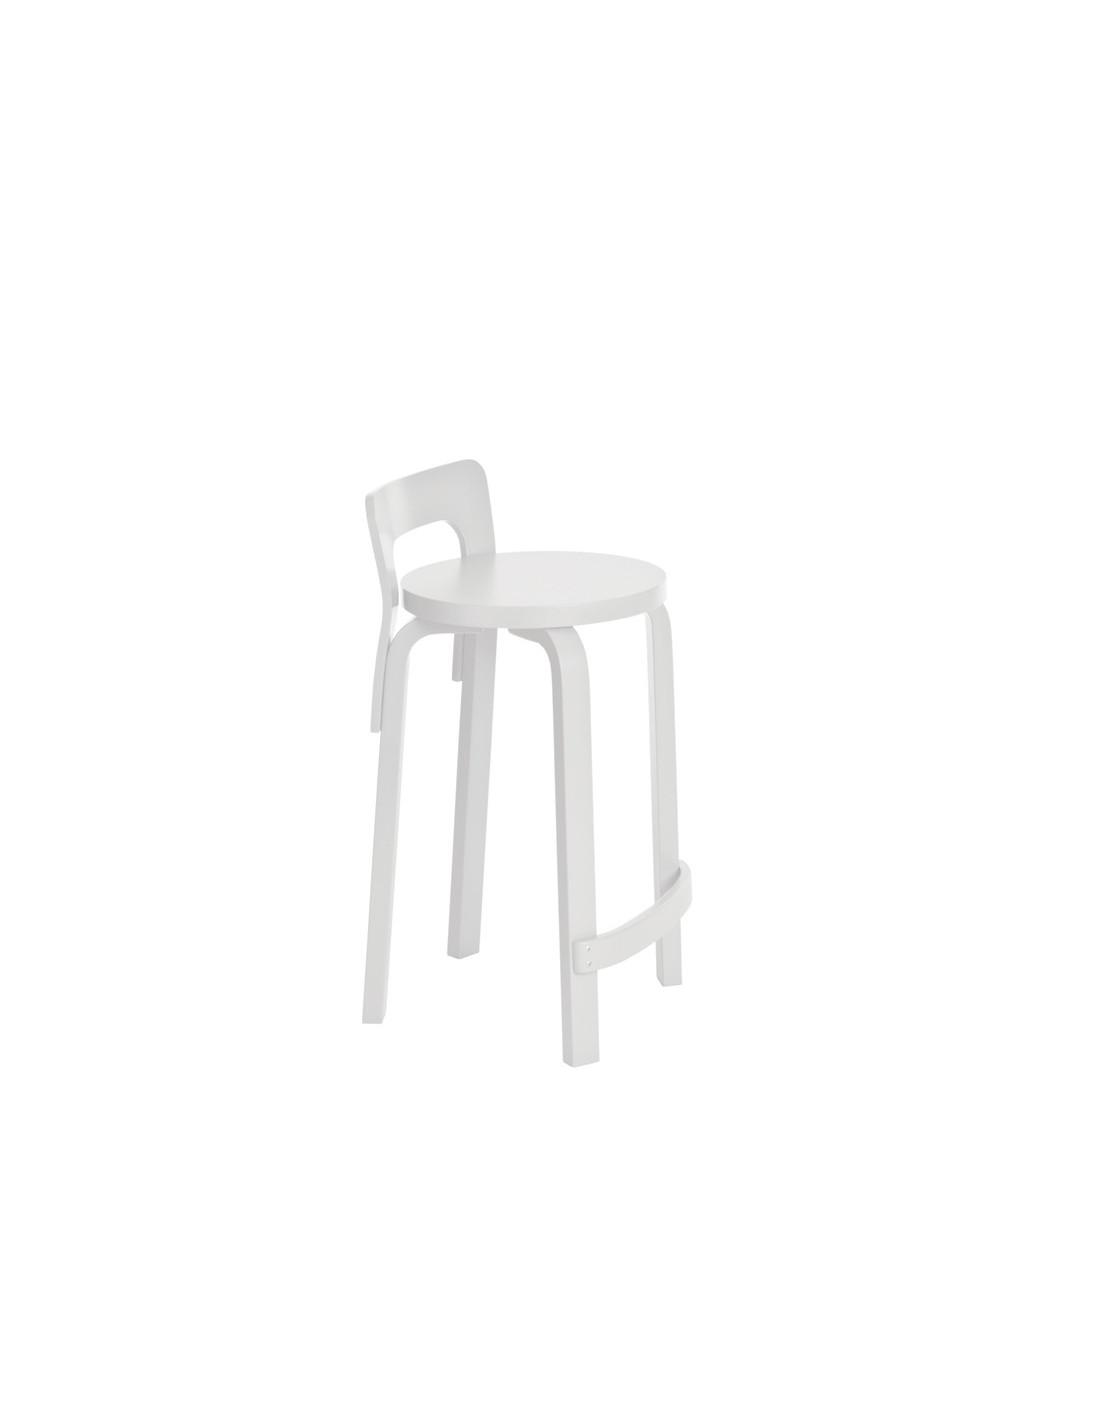 K65 high stool alvar aalto design for artek la boutique for Alvar aalto chaise lounge